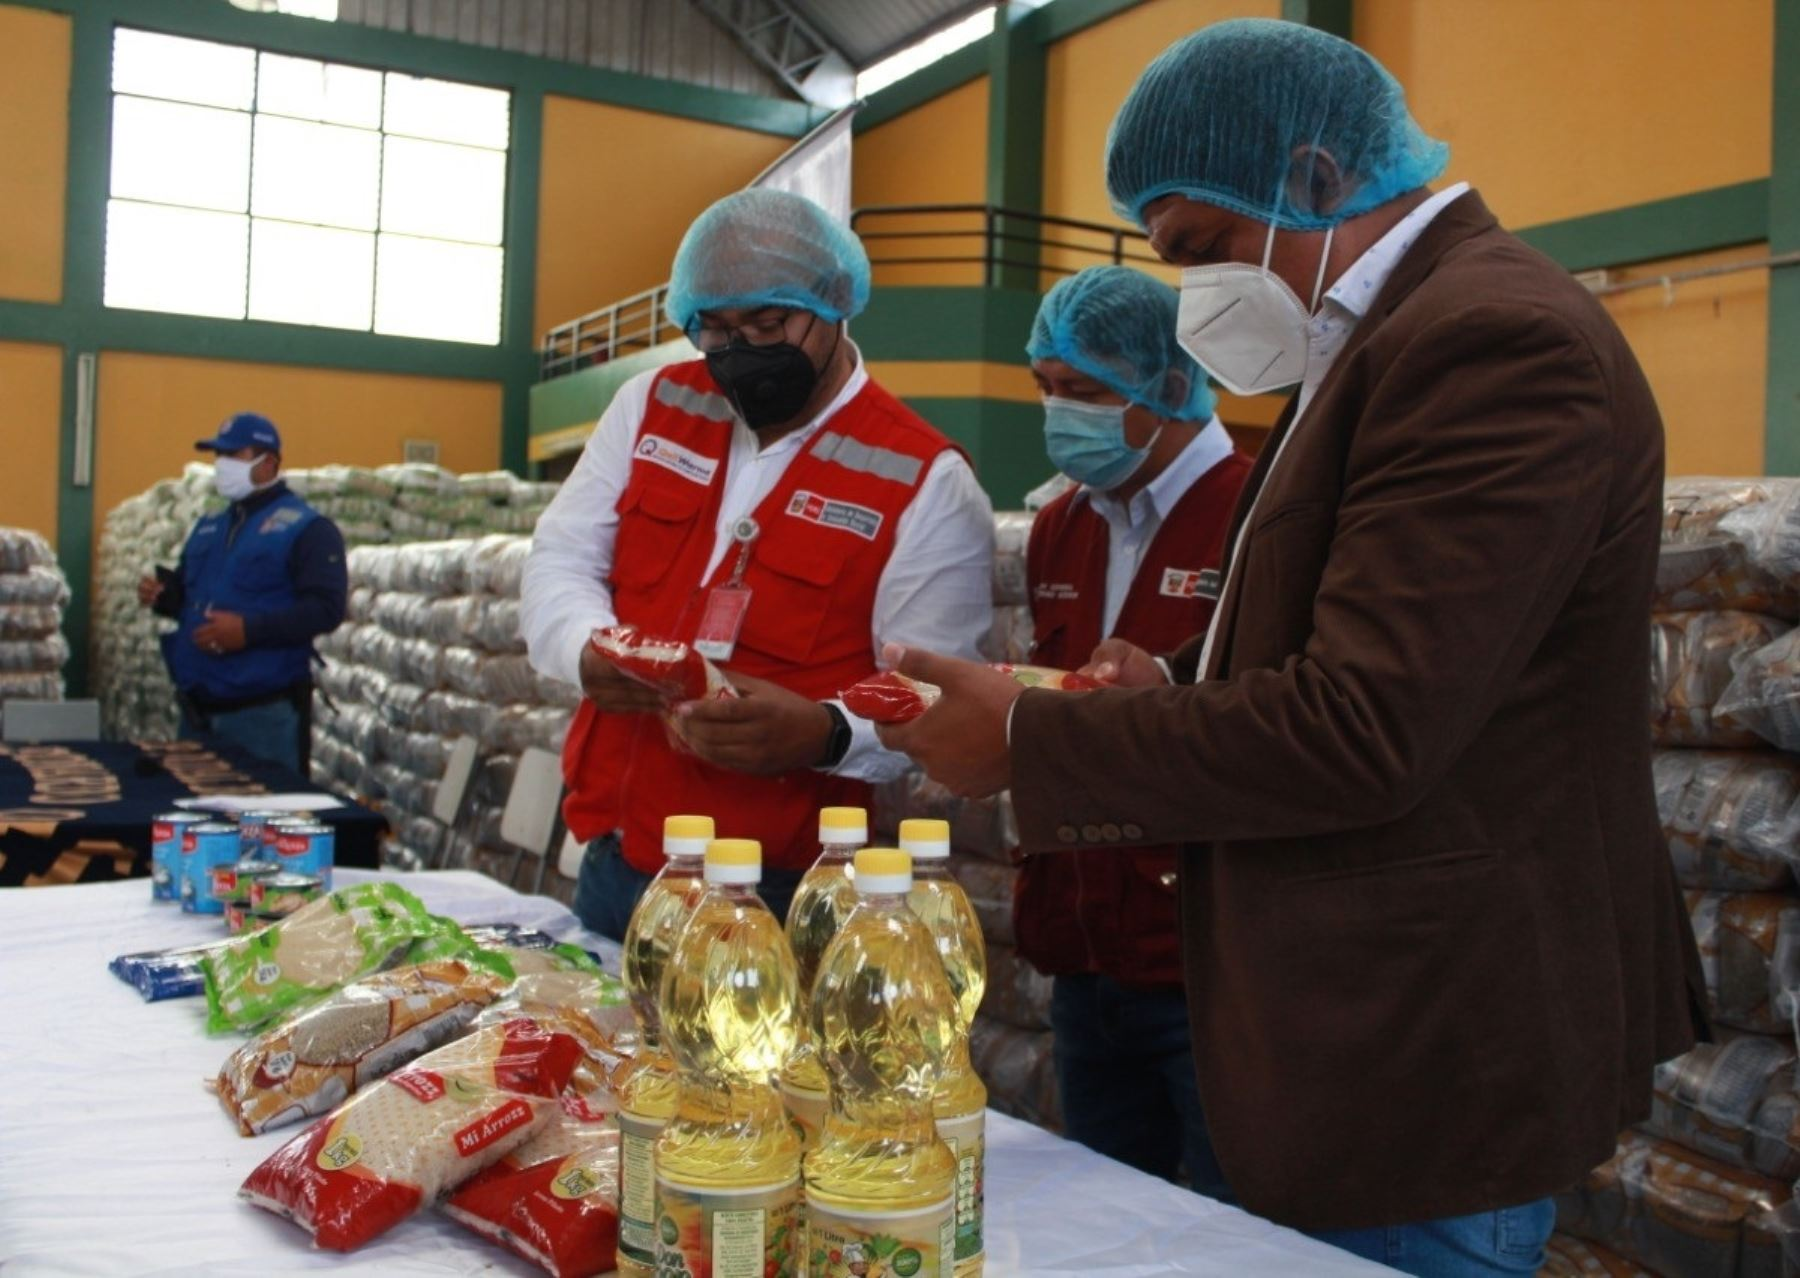 lambayeque-qali-warma-entrega-450-toneladas-de-alimentos-a-municipio-de-leonardo-ortiz